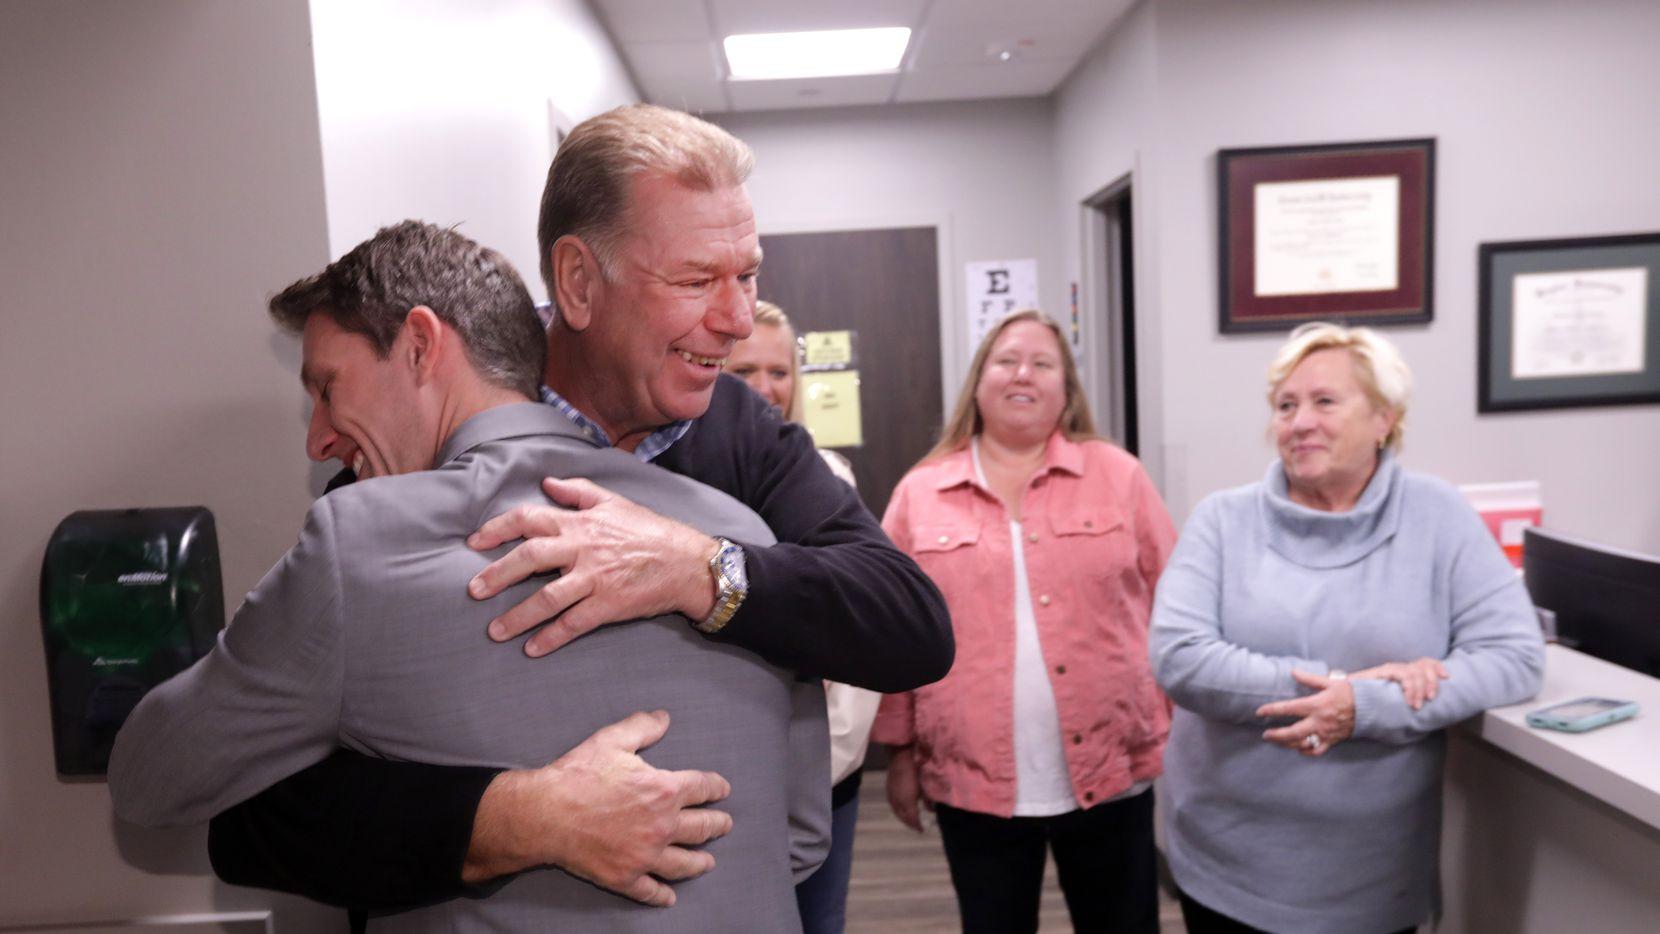 Dr. Andrew Parker, left, and Dennis Bennett embrace after meeting at Allen Orthopedics and Sports Medicine in Allen, TX, on Nov. 13, 2019. (Jason Janik/Special Contributor)